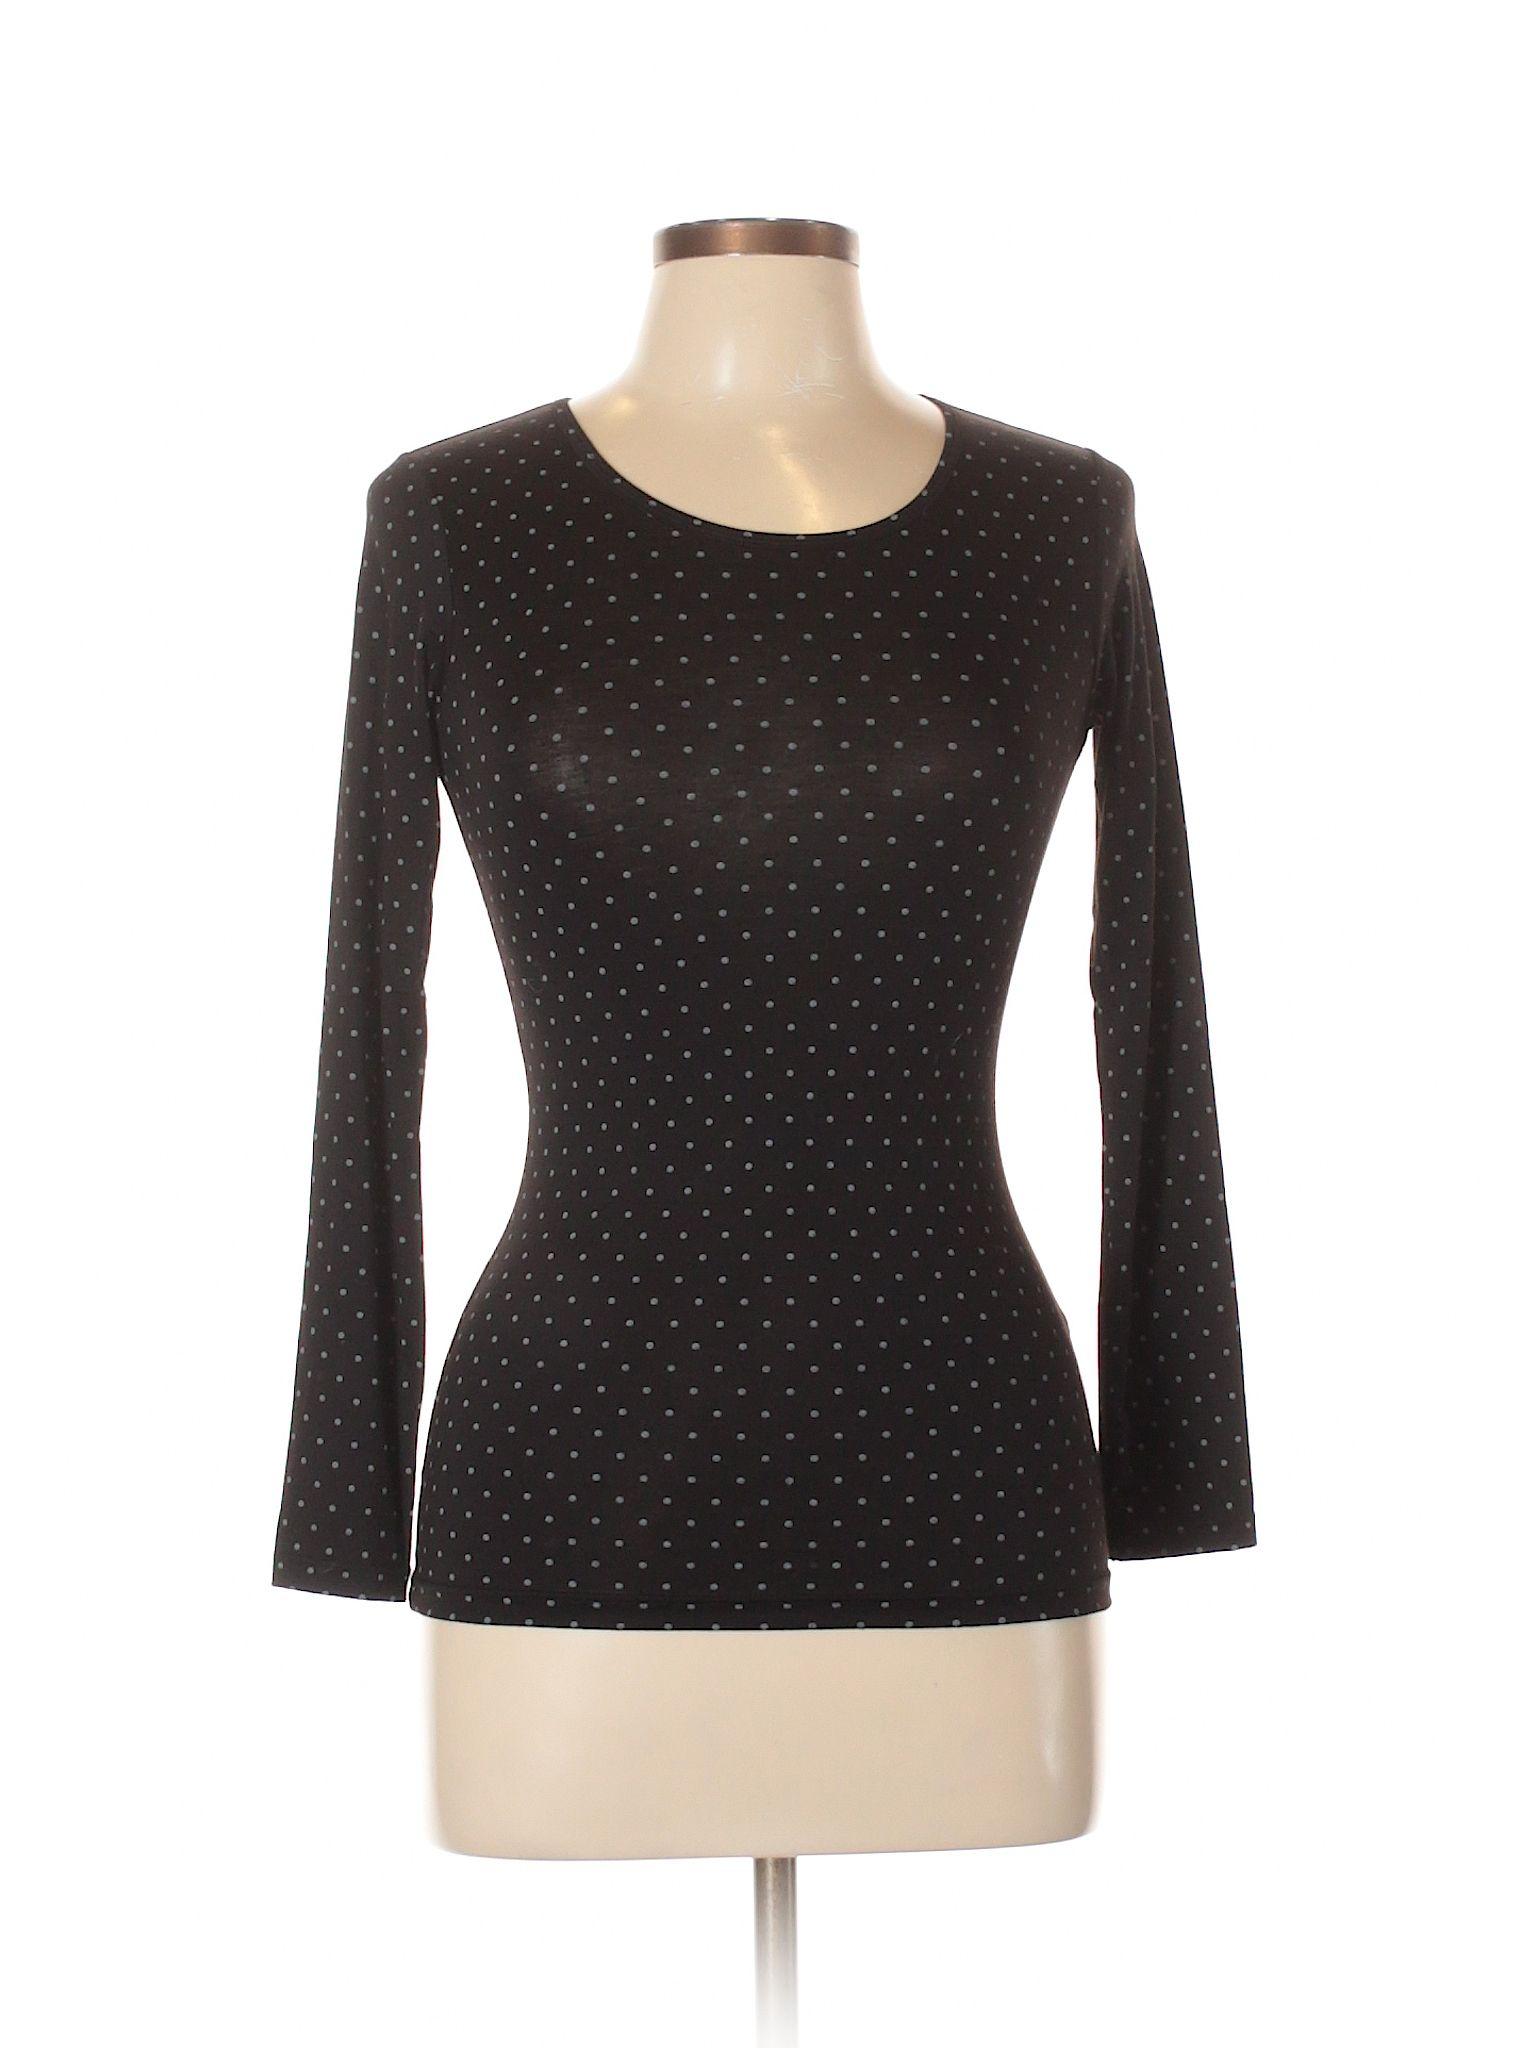 Ut for uniqlo long sleeve t shirt size black womenus tops